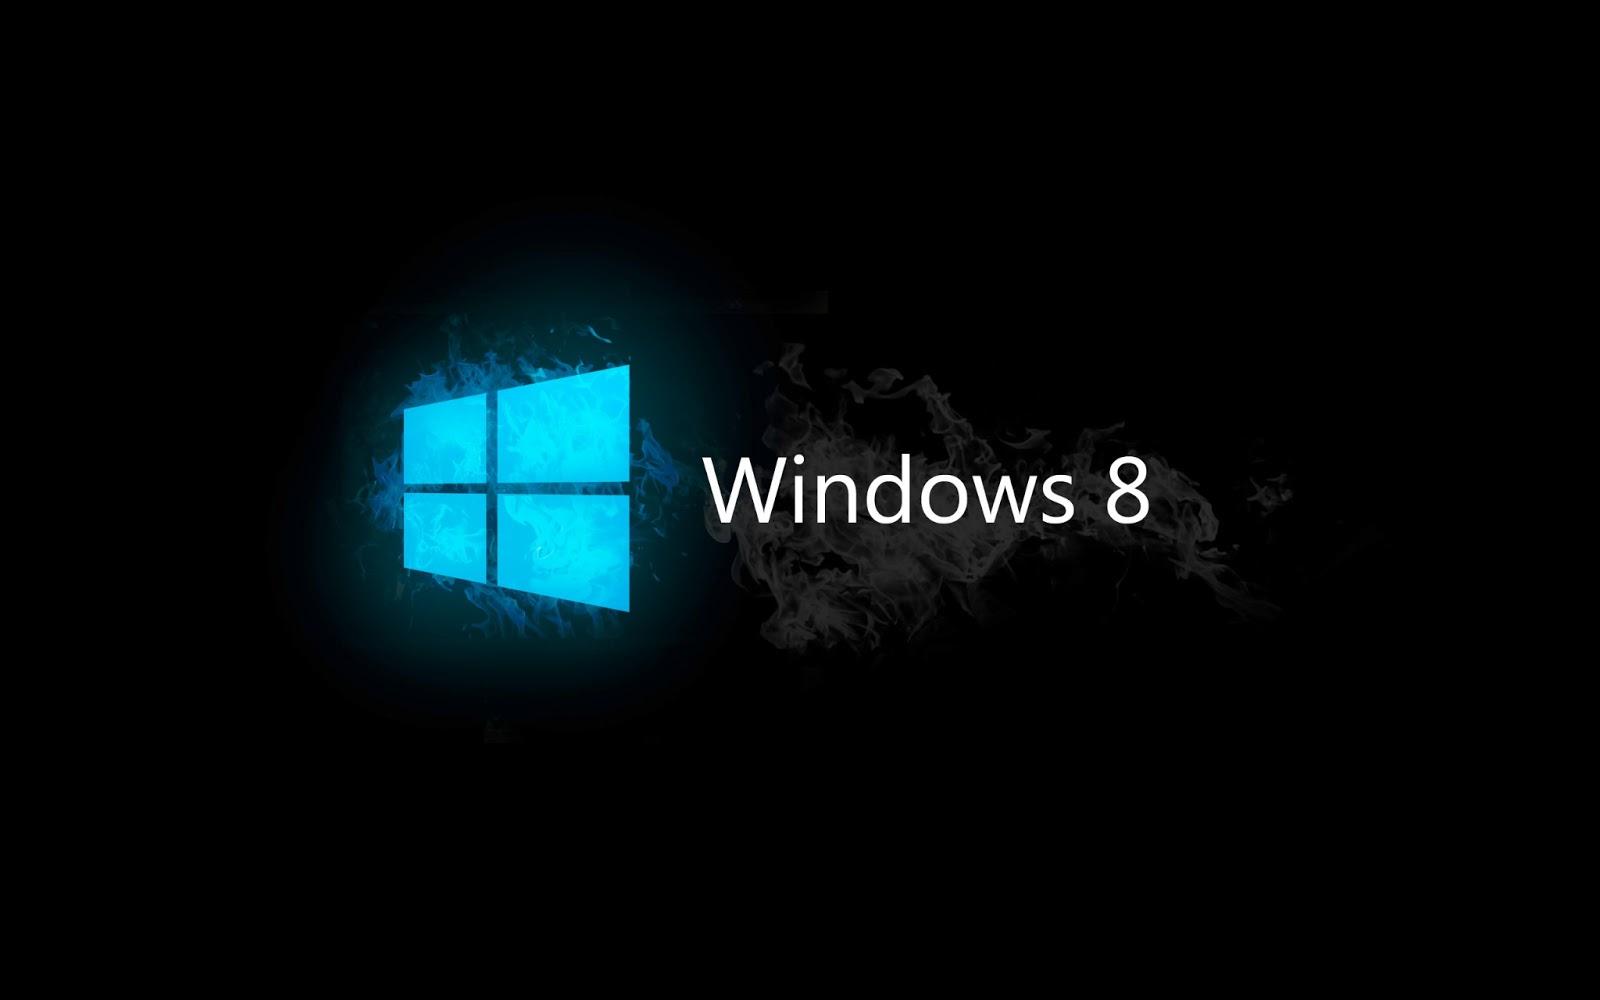 hd Windows 8 Desktop Wallpapers r Desktop BackgroundsPicture in HD 1600x1000